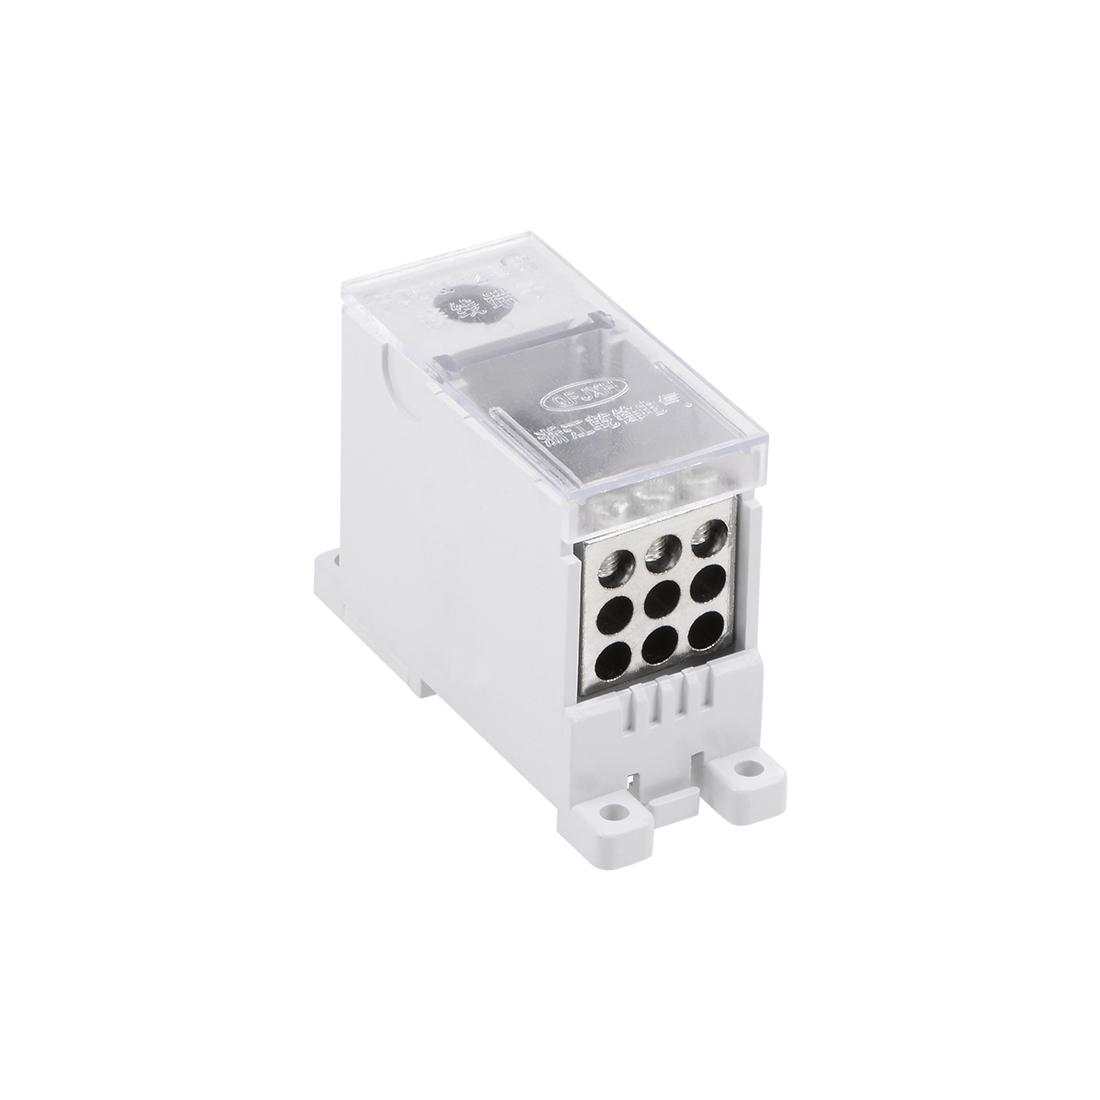 1 Input 9 Output DIN Rail Terminal Blocks Connectors Distribution Block